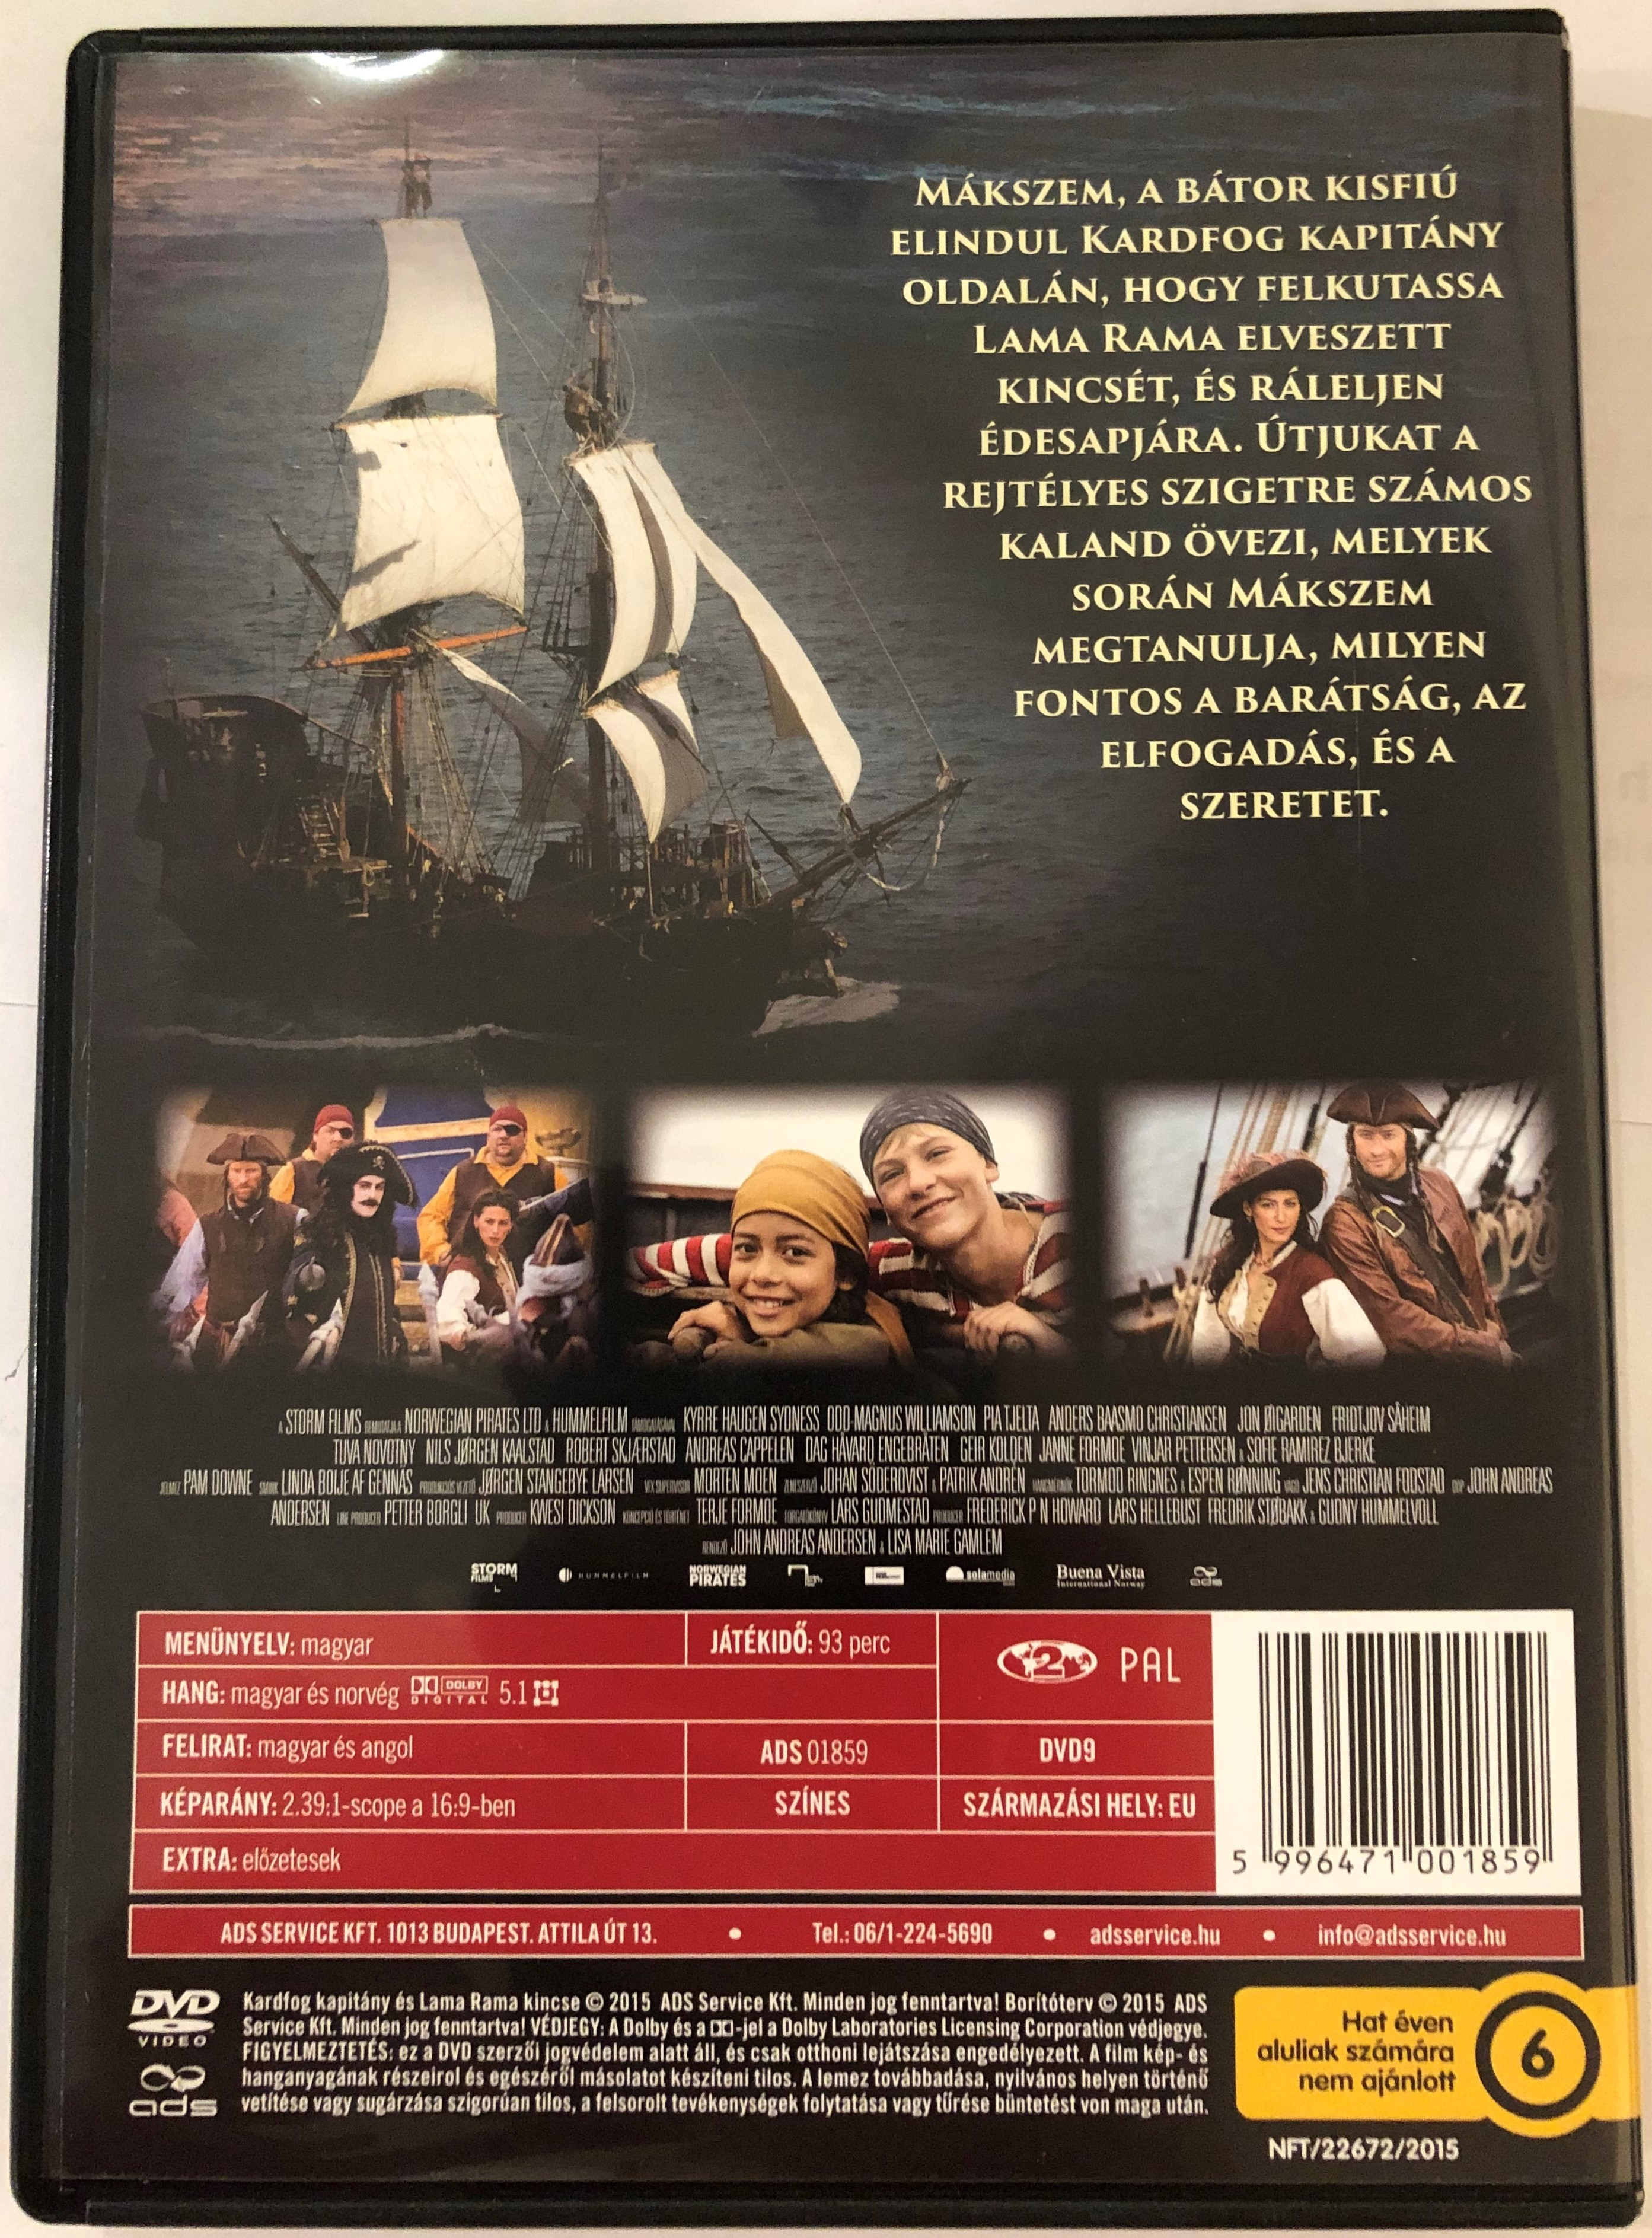 captain-sabertooth-dvd-2014-kaptein-sabeltann-og-skatten-i-lama-rama-kardfog-kapit-ny-s-a-lama-rama-kincse-2-.jpg